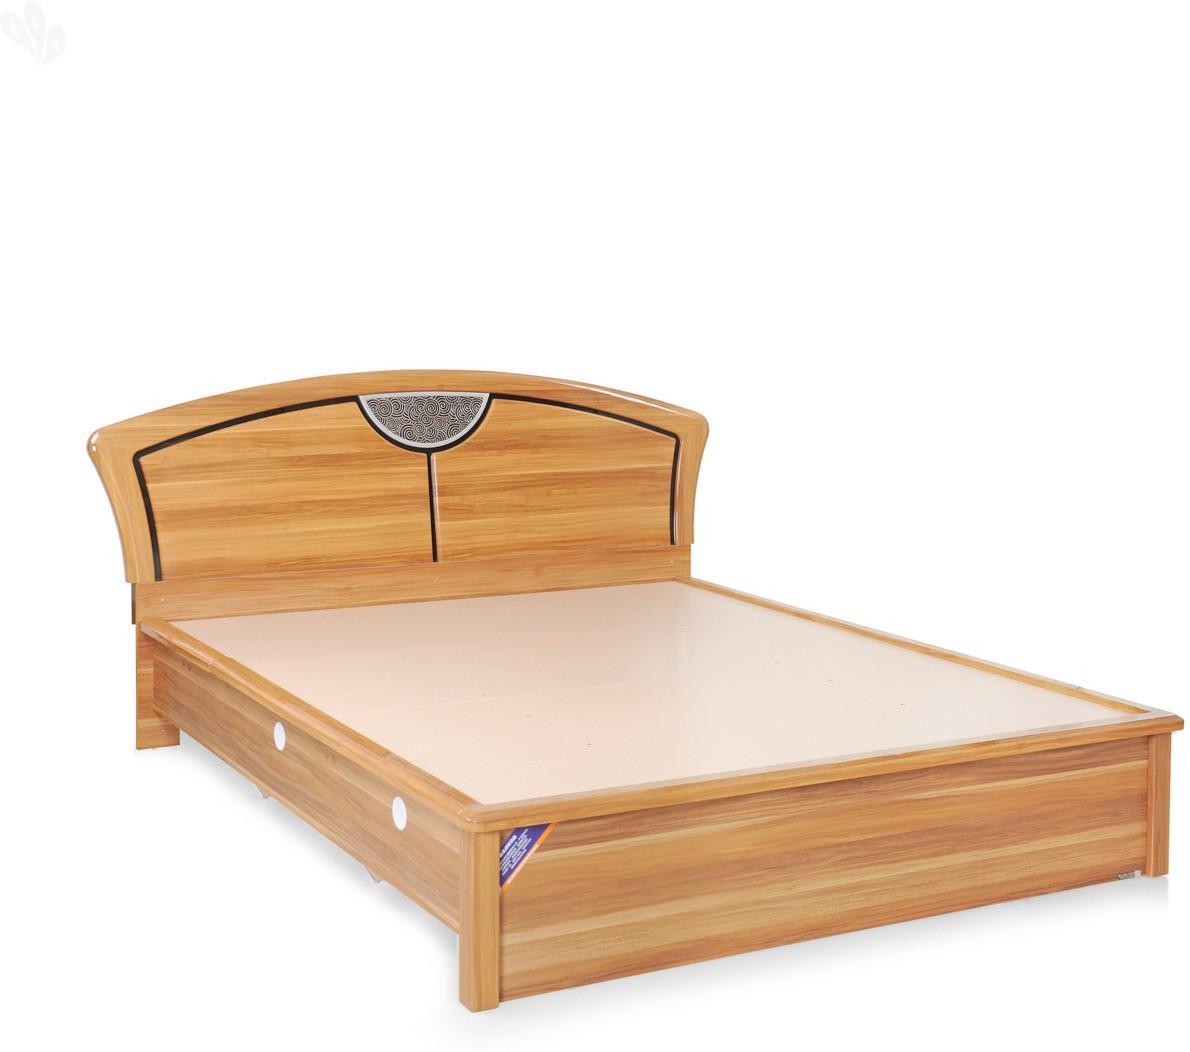 RoyalOak Furniture Price List